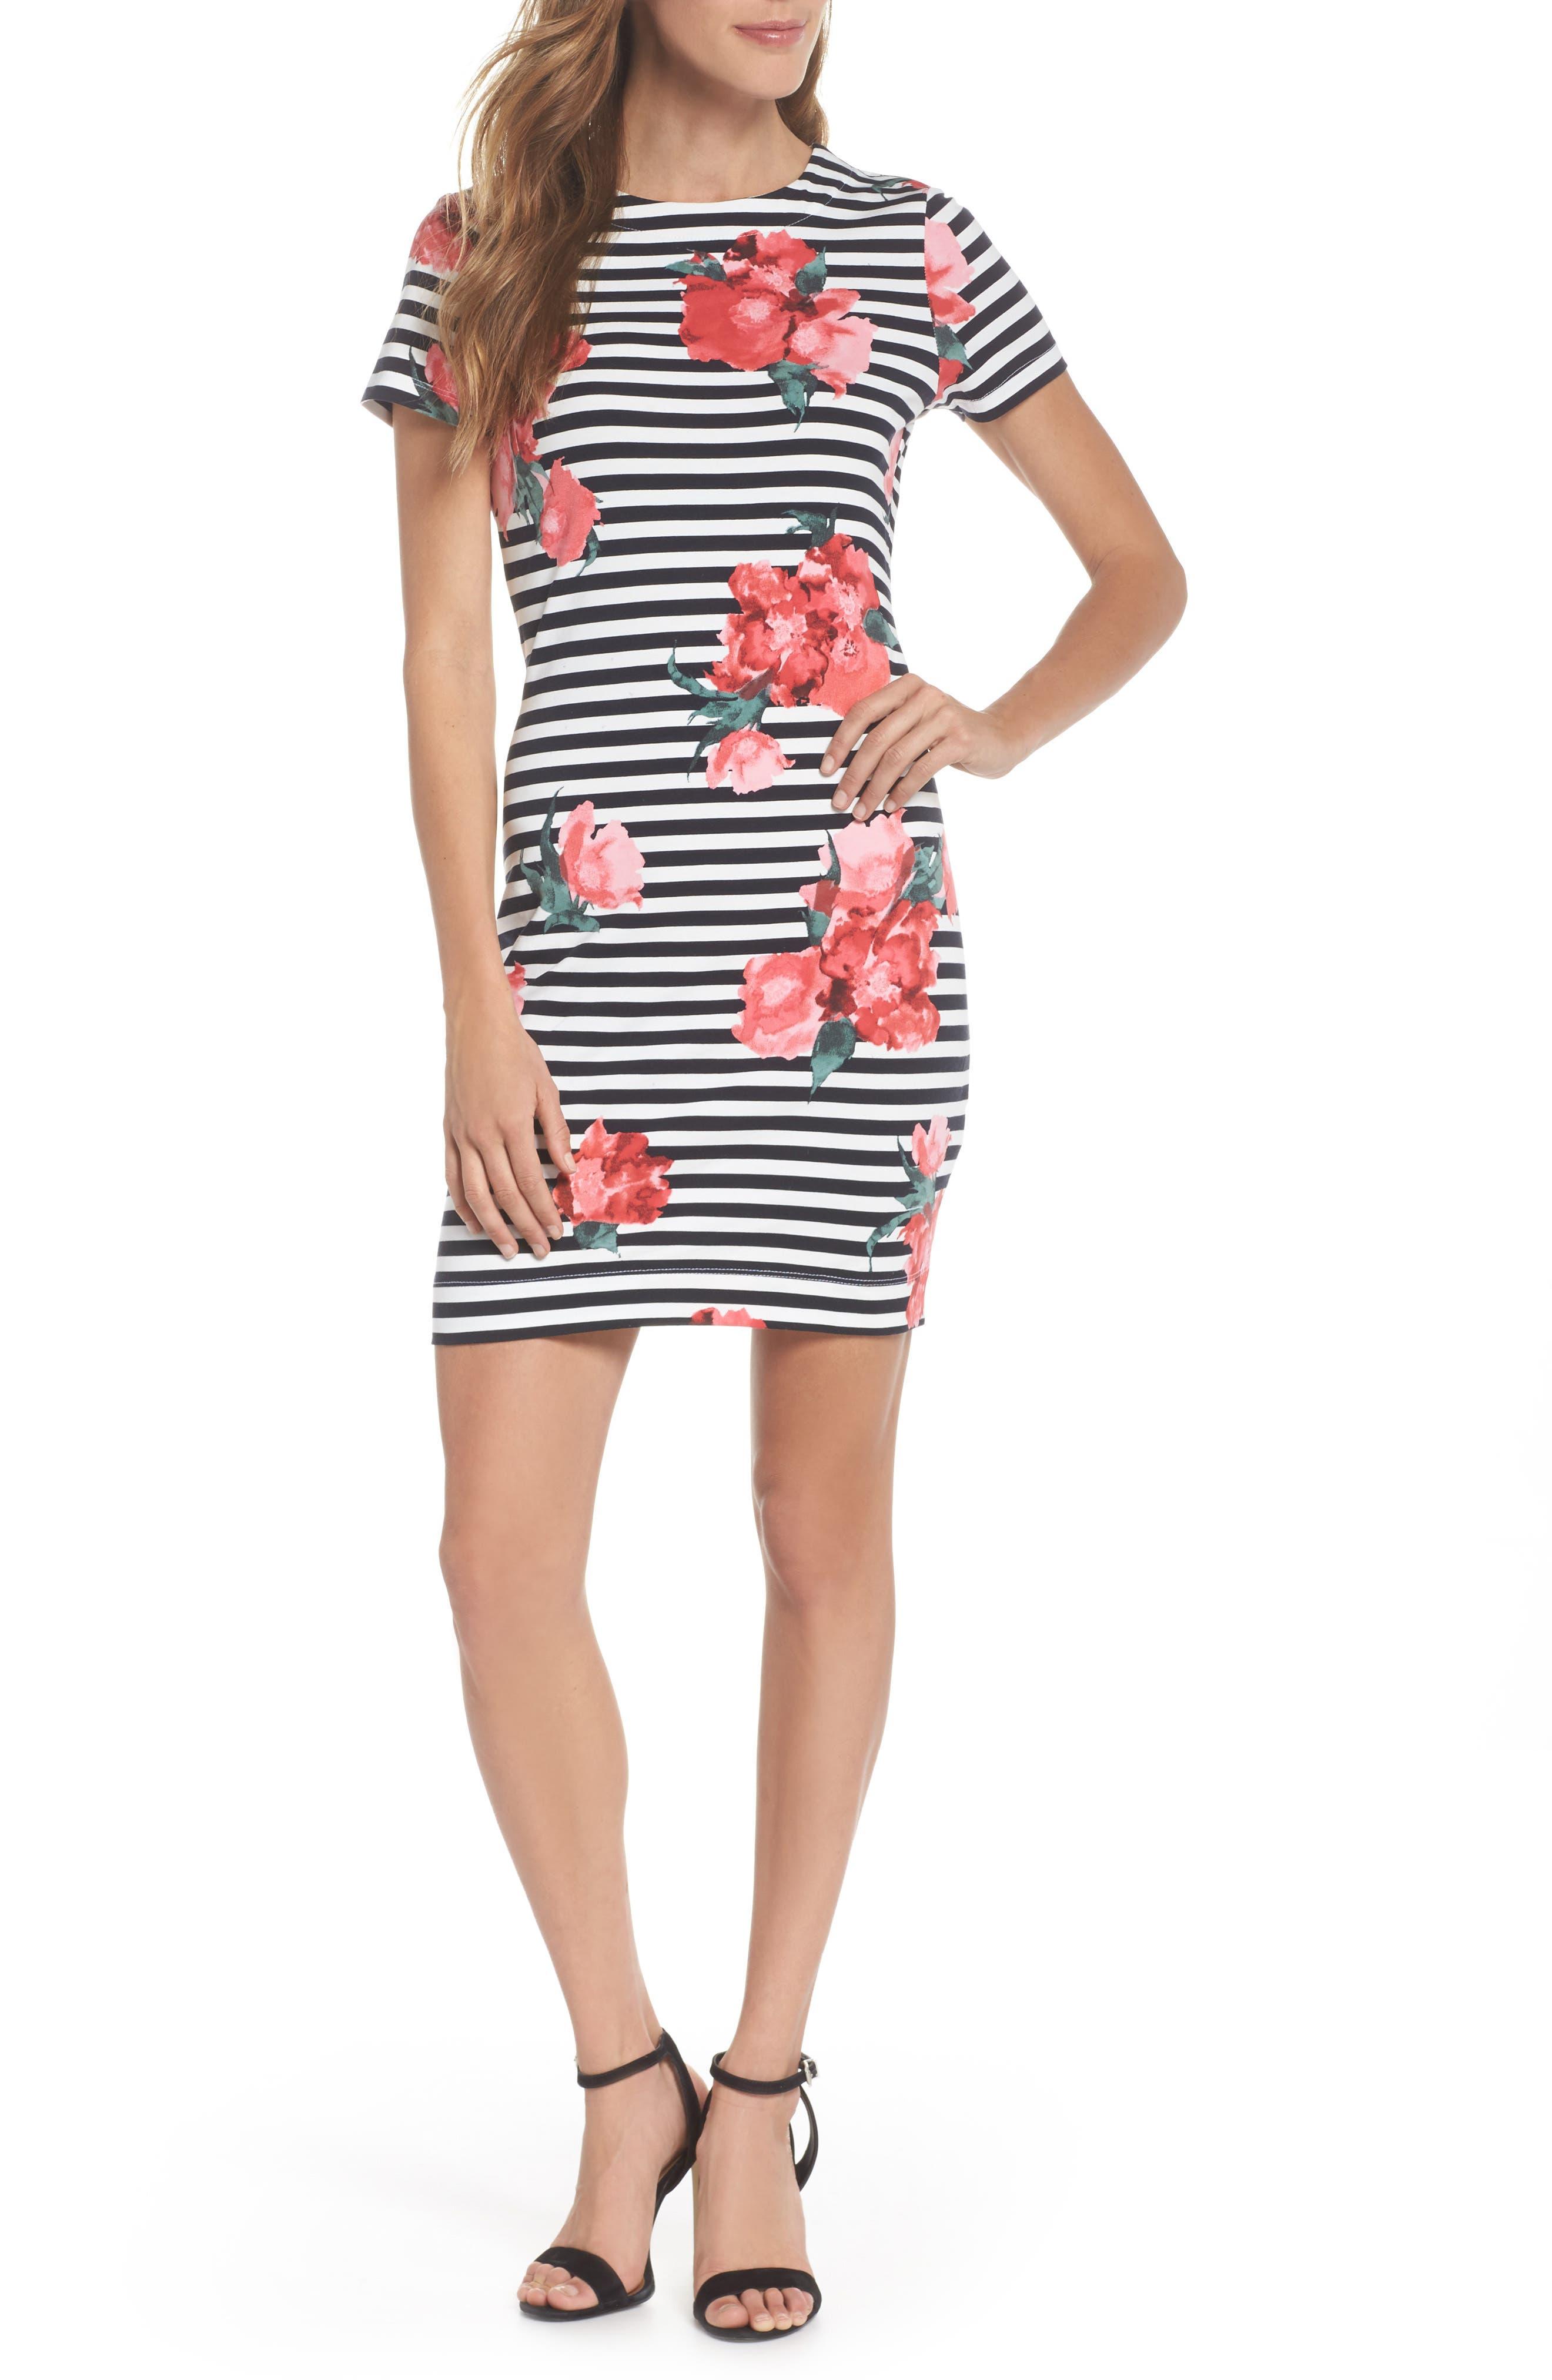 Jude Flower Stripe Knit Dress,                             Main thumbnail 1, color,                             488